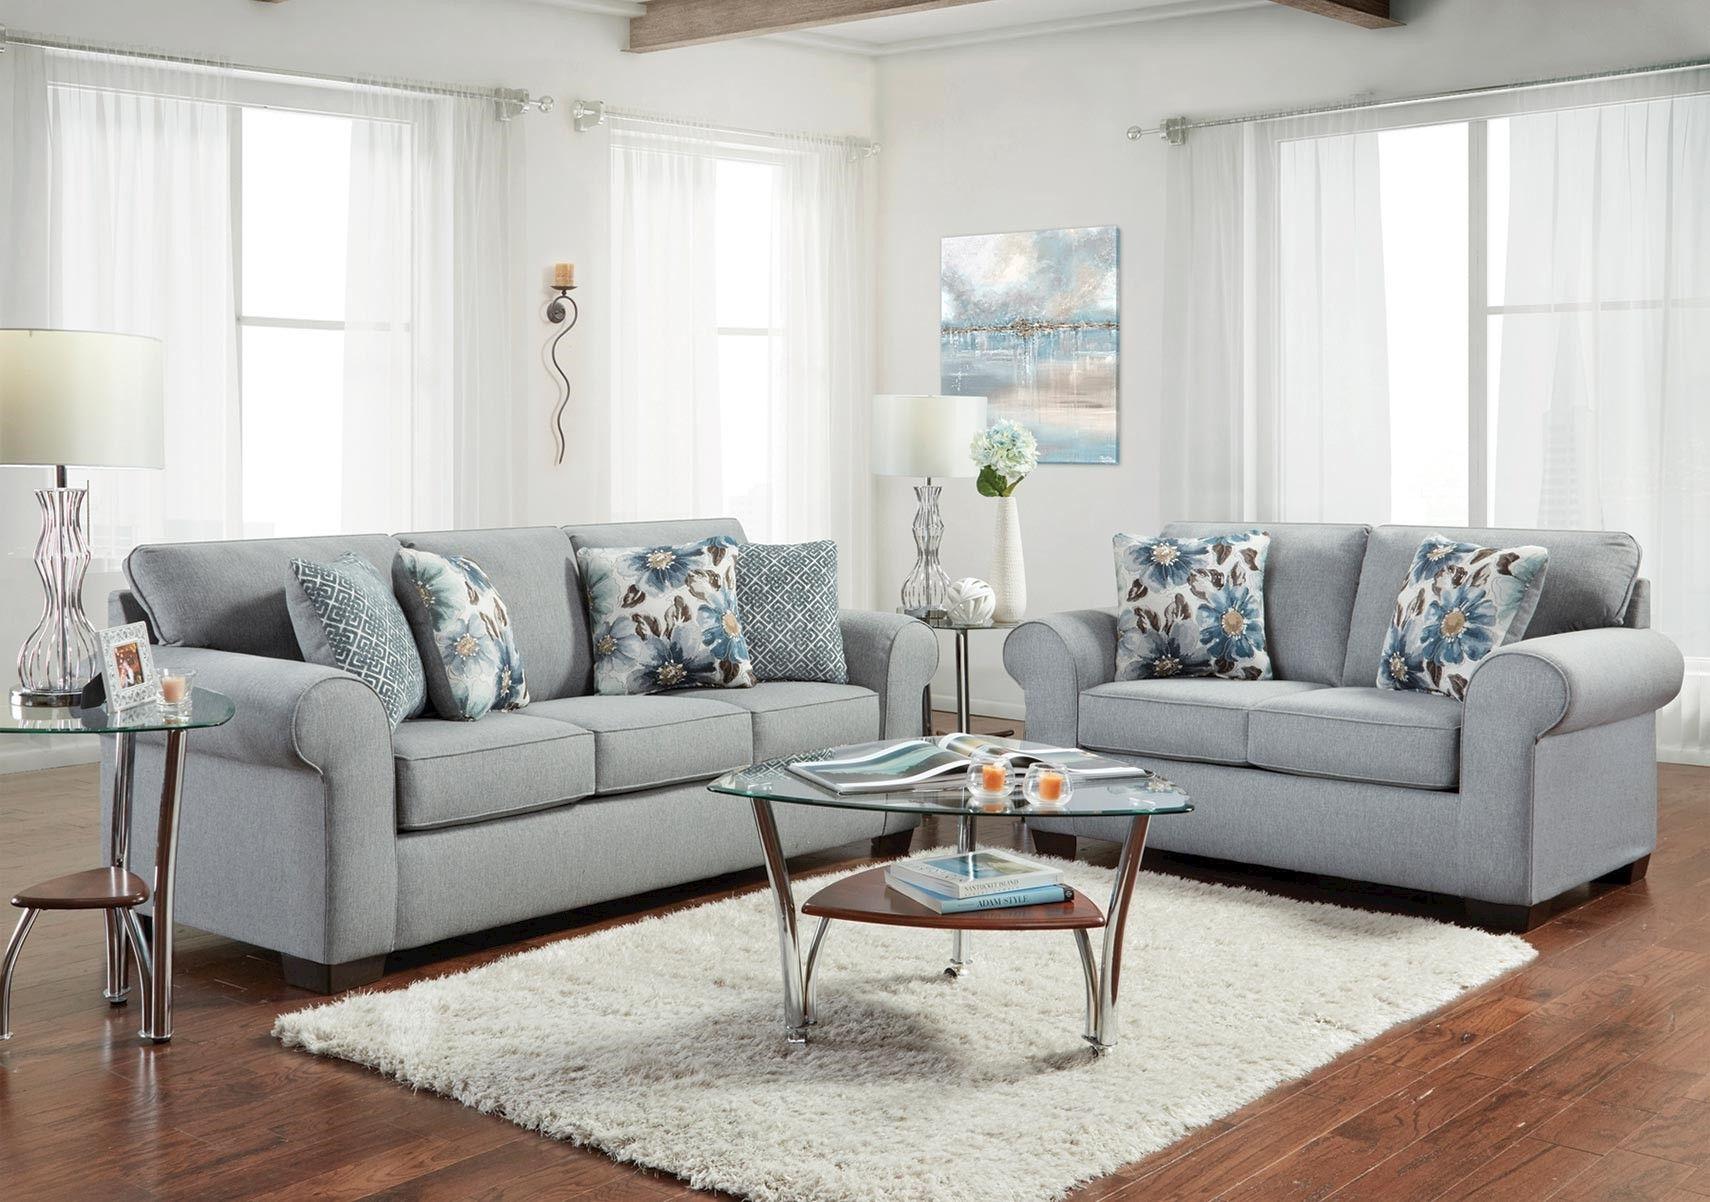 Lacks Katerina 2 Pc Living Room Set Sofa And Loveseat Set Loveseat Sofa Living Room Sets #upholstered #living #room #sets